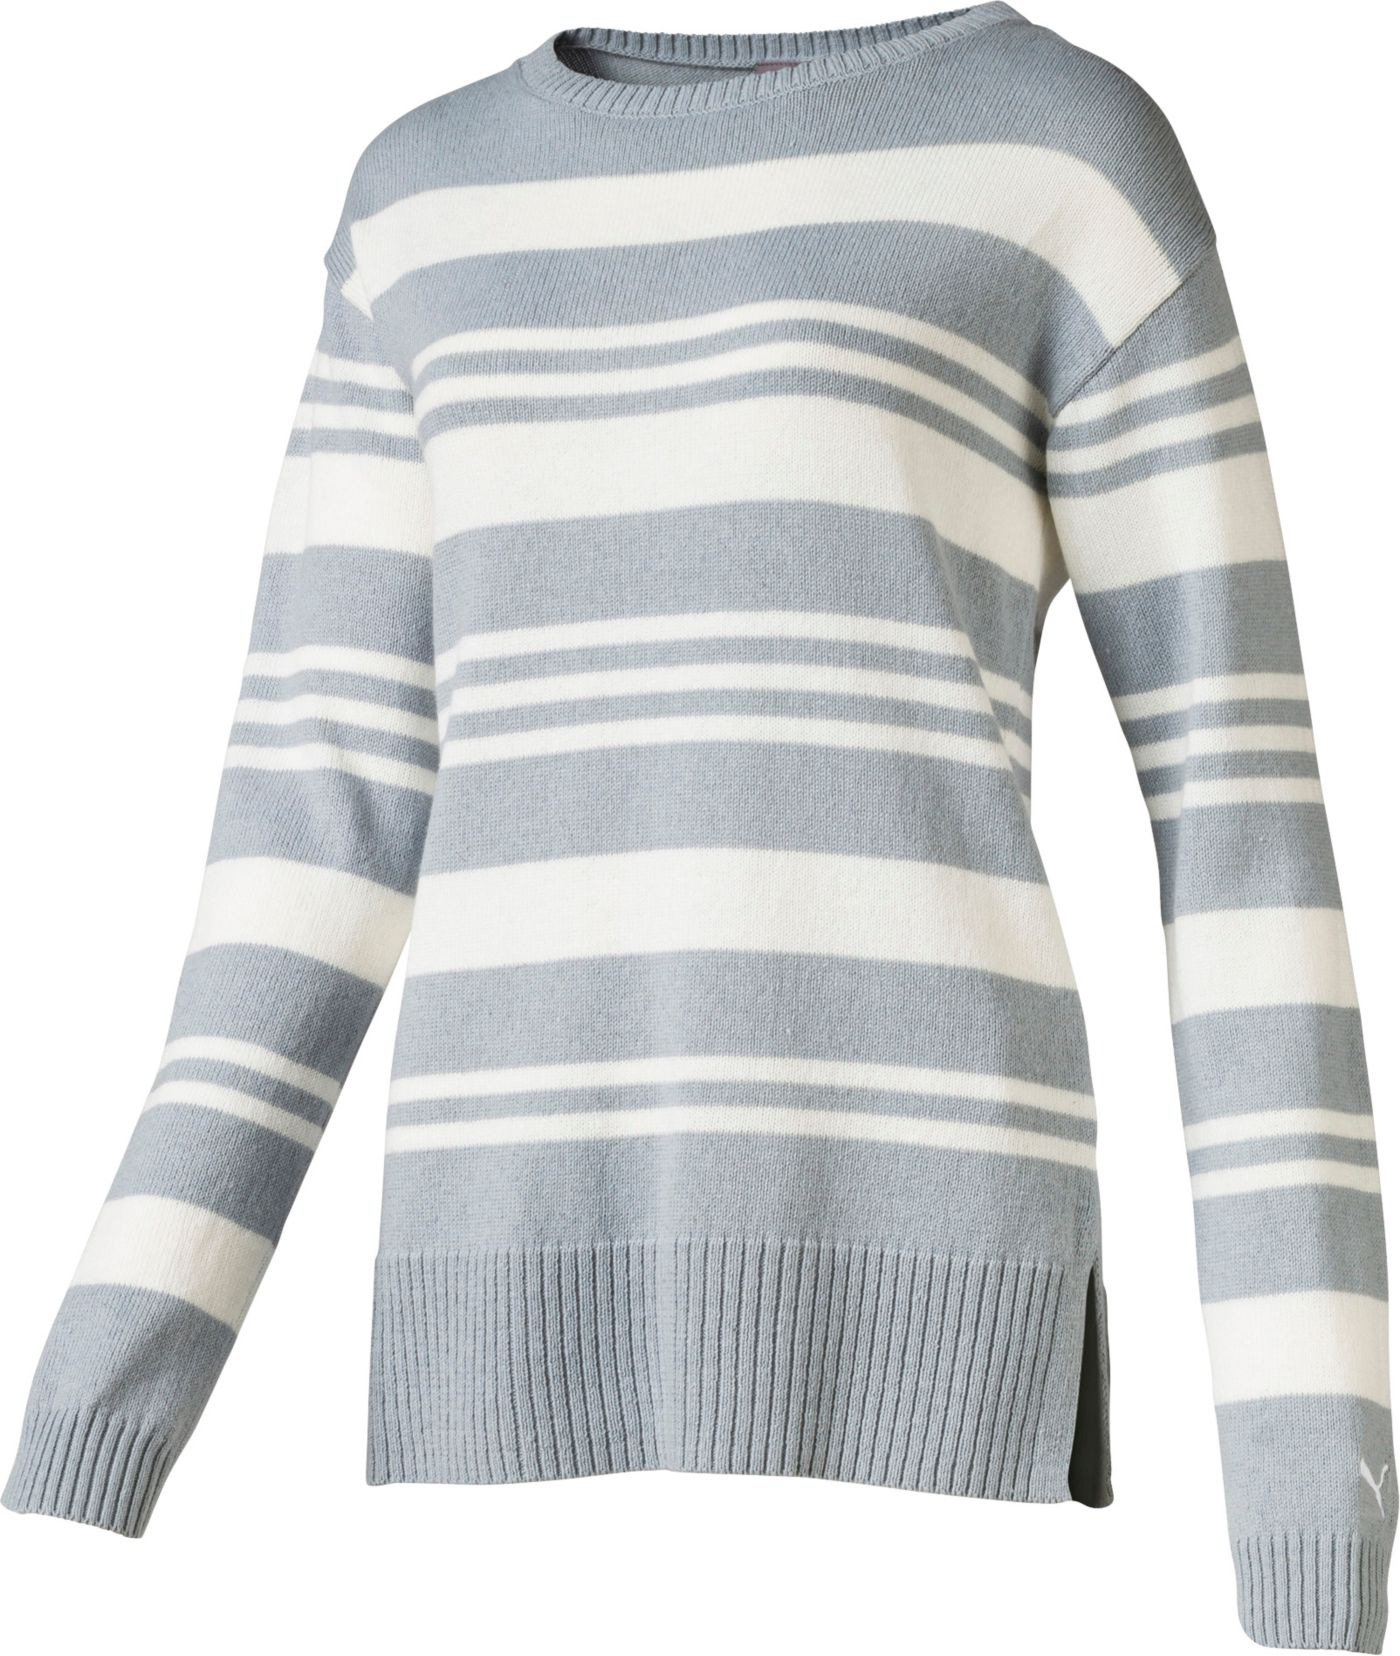 PUMA Women's Nautical Golf Sweater